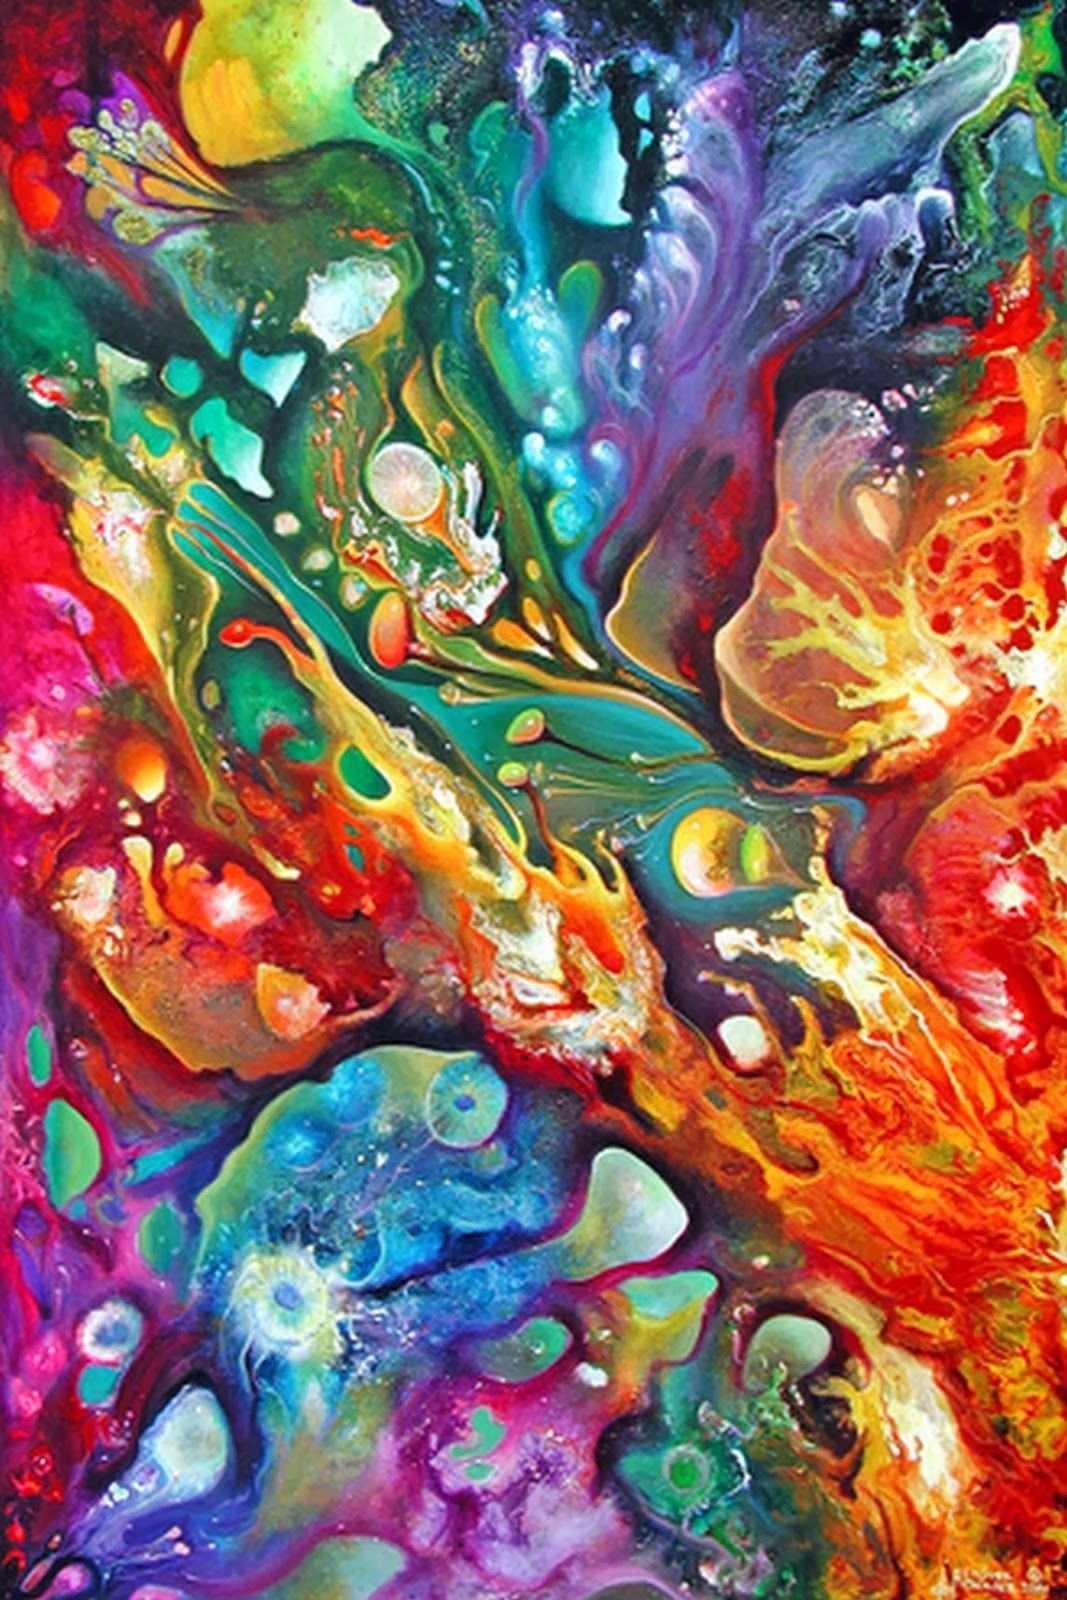 Pinturas de abstractos modernos decorativos cuadros for Imagenes de cuadros abstractos texturados